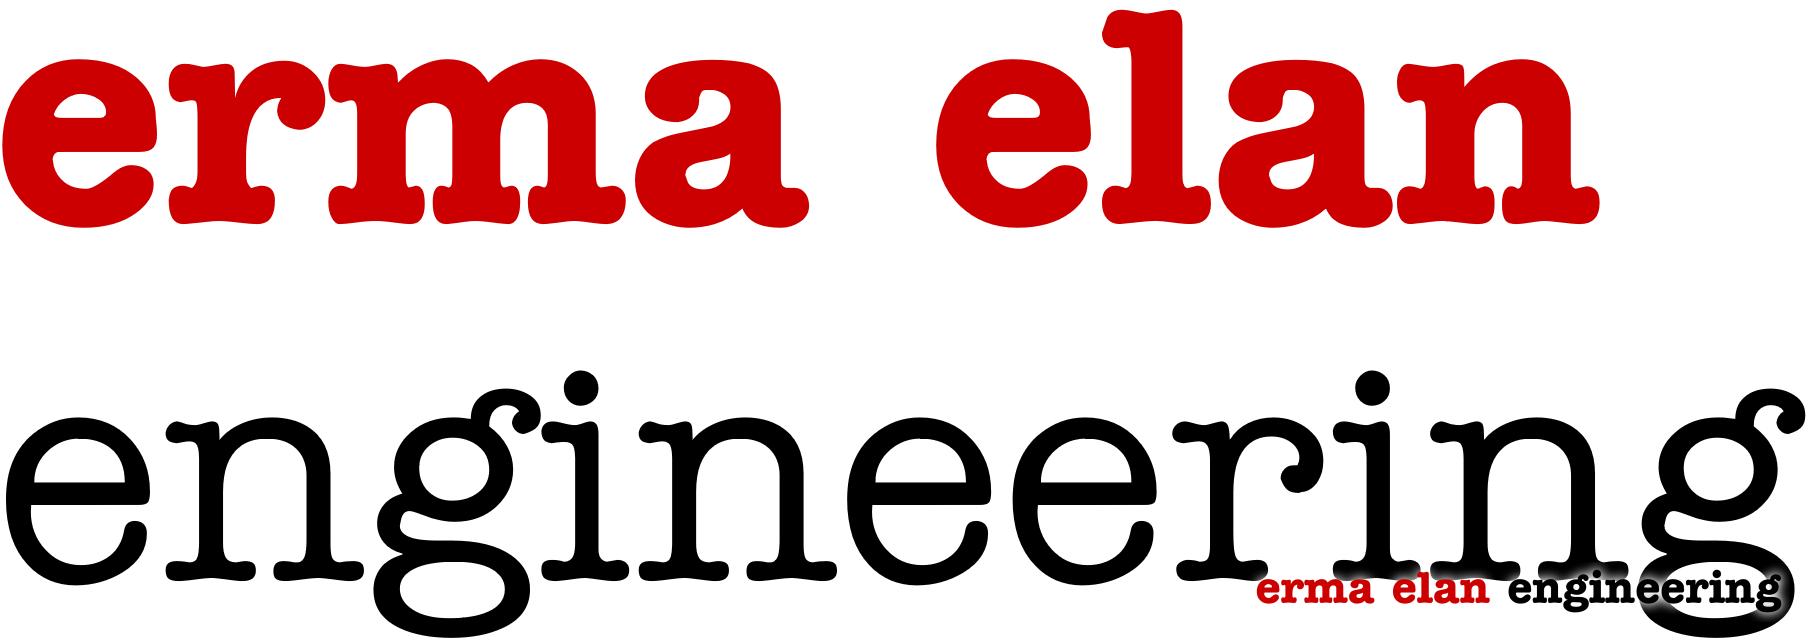 Erma Elan Egineering s. r. o.